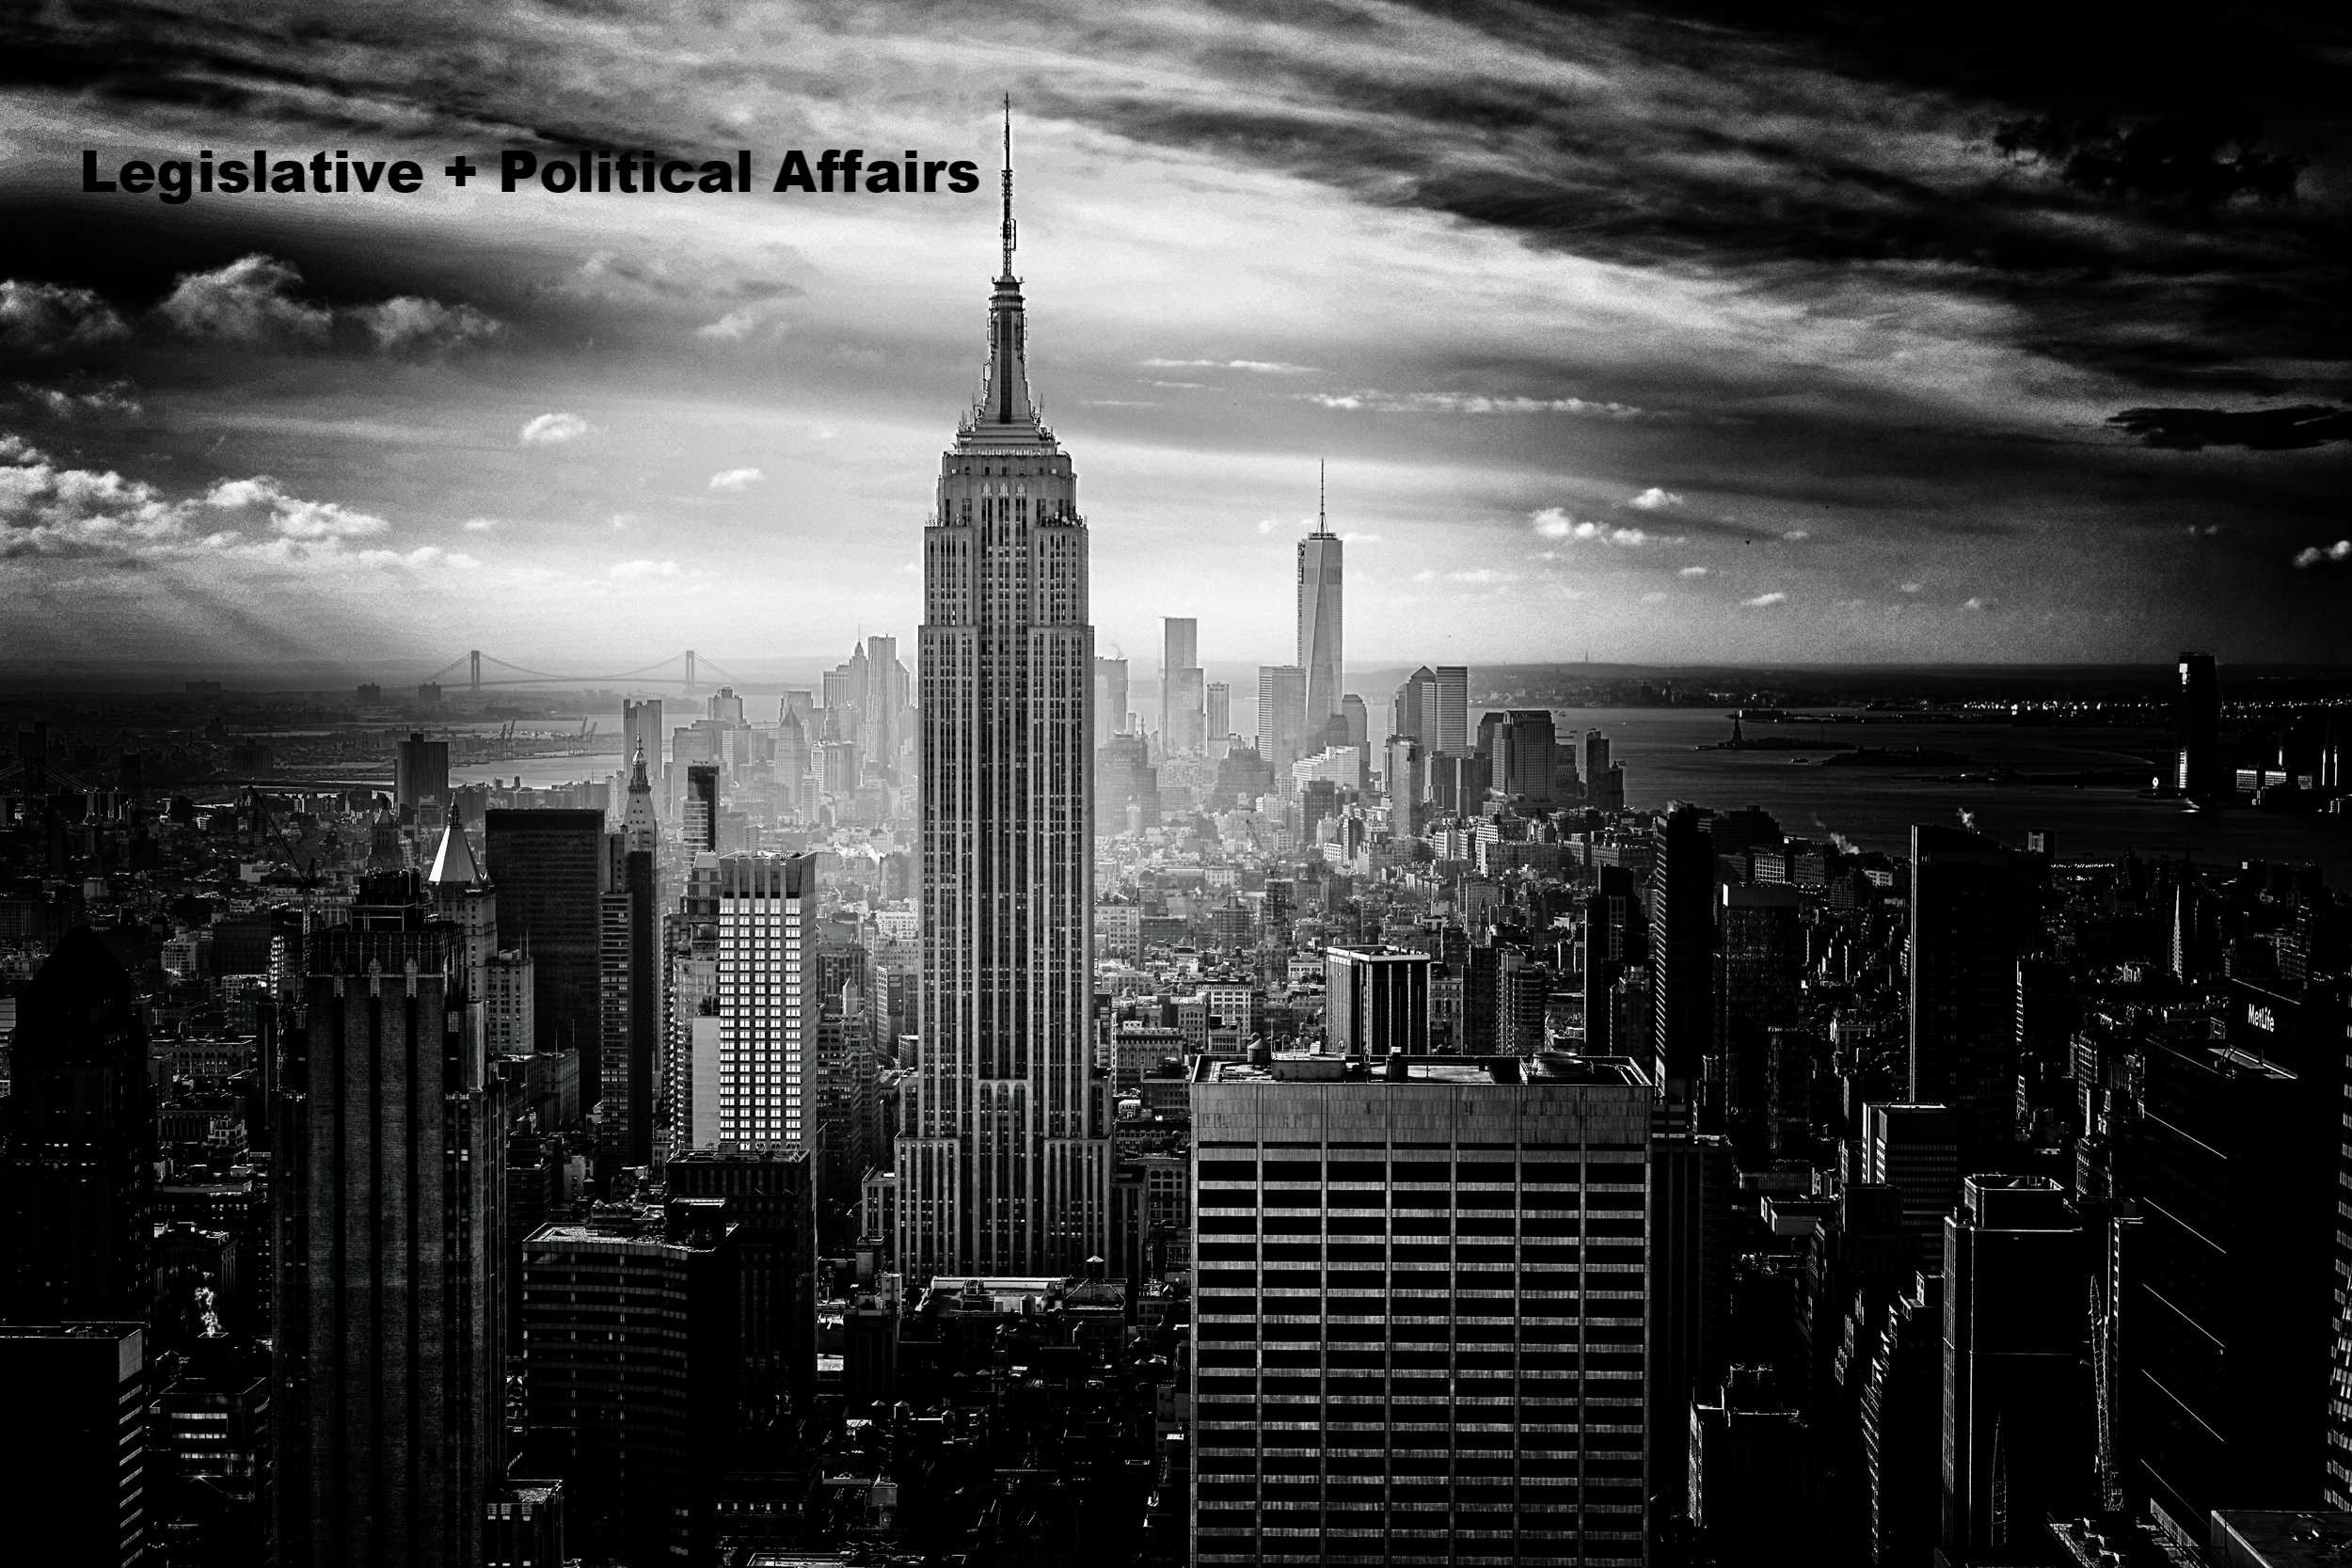 Legislative + Political Affairs